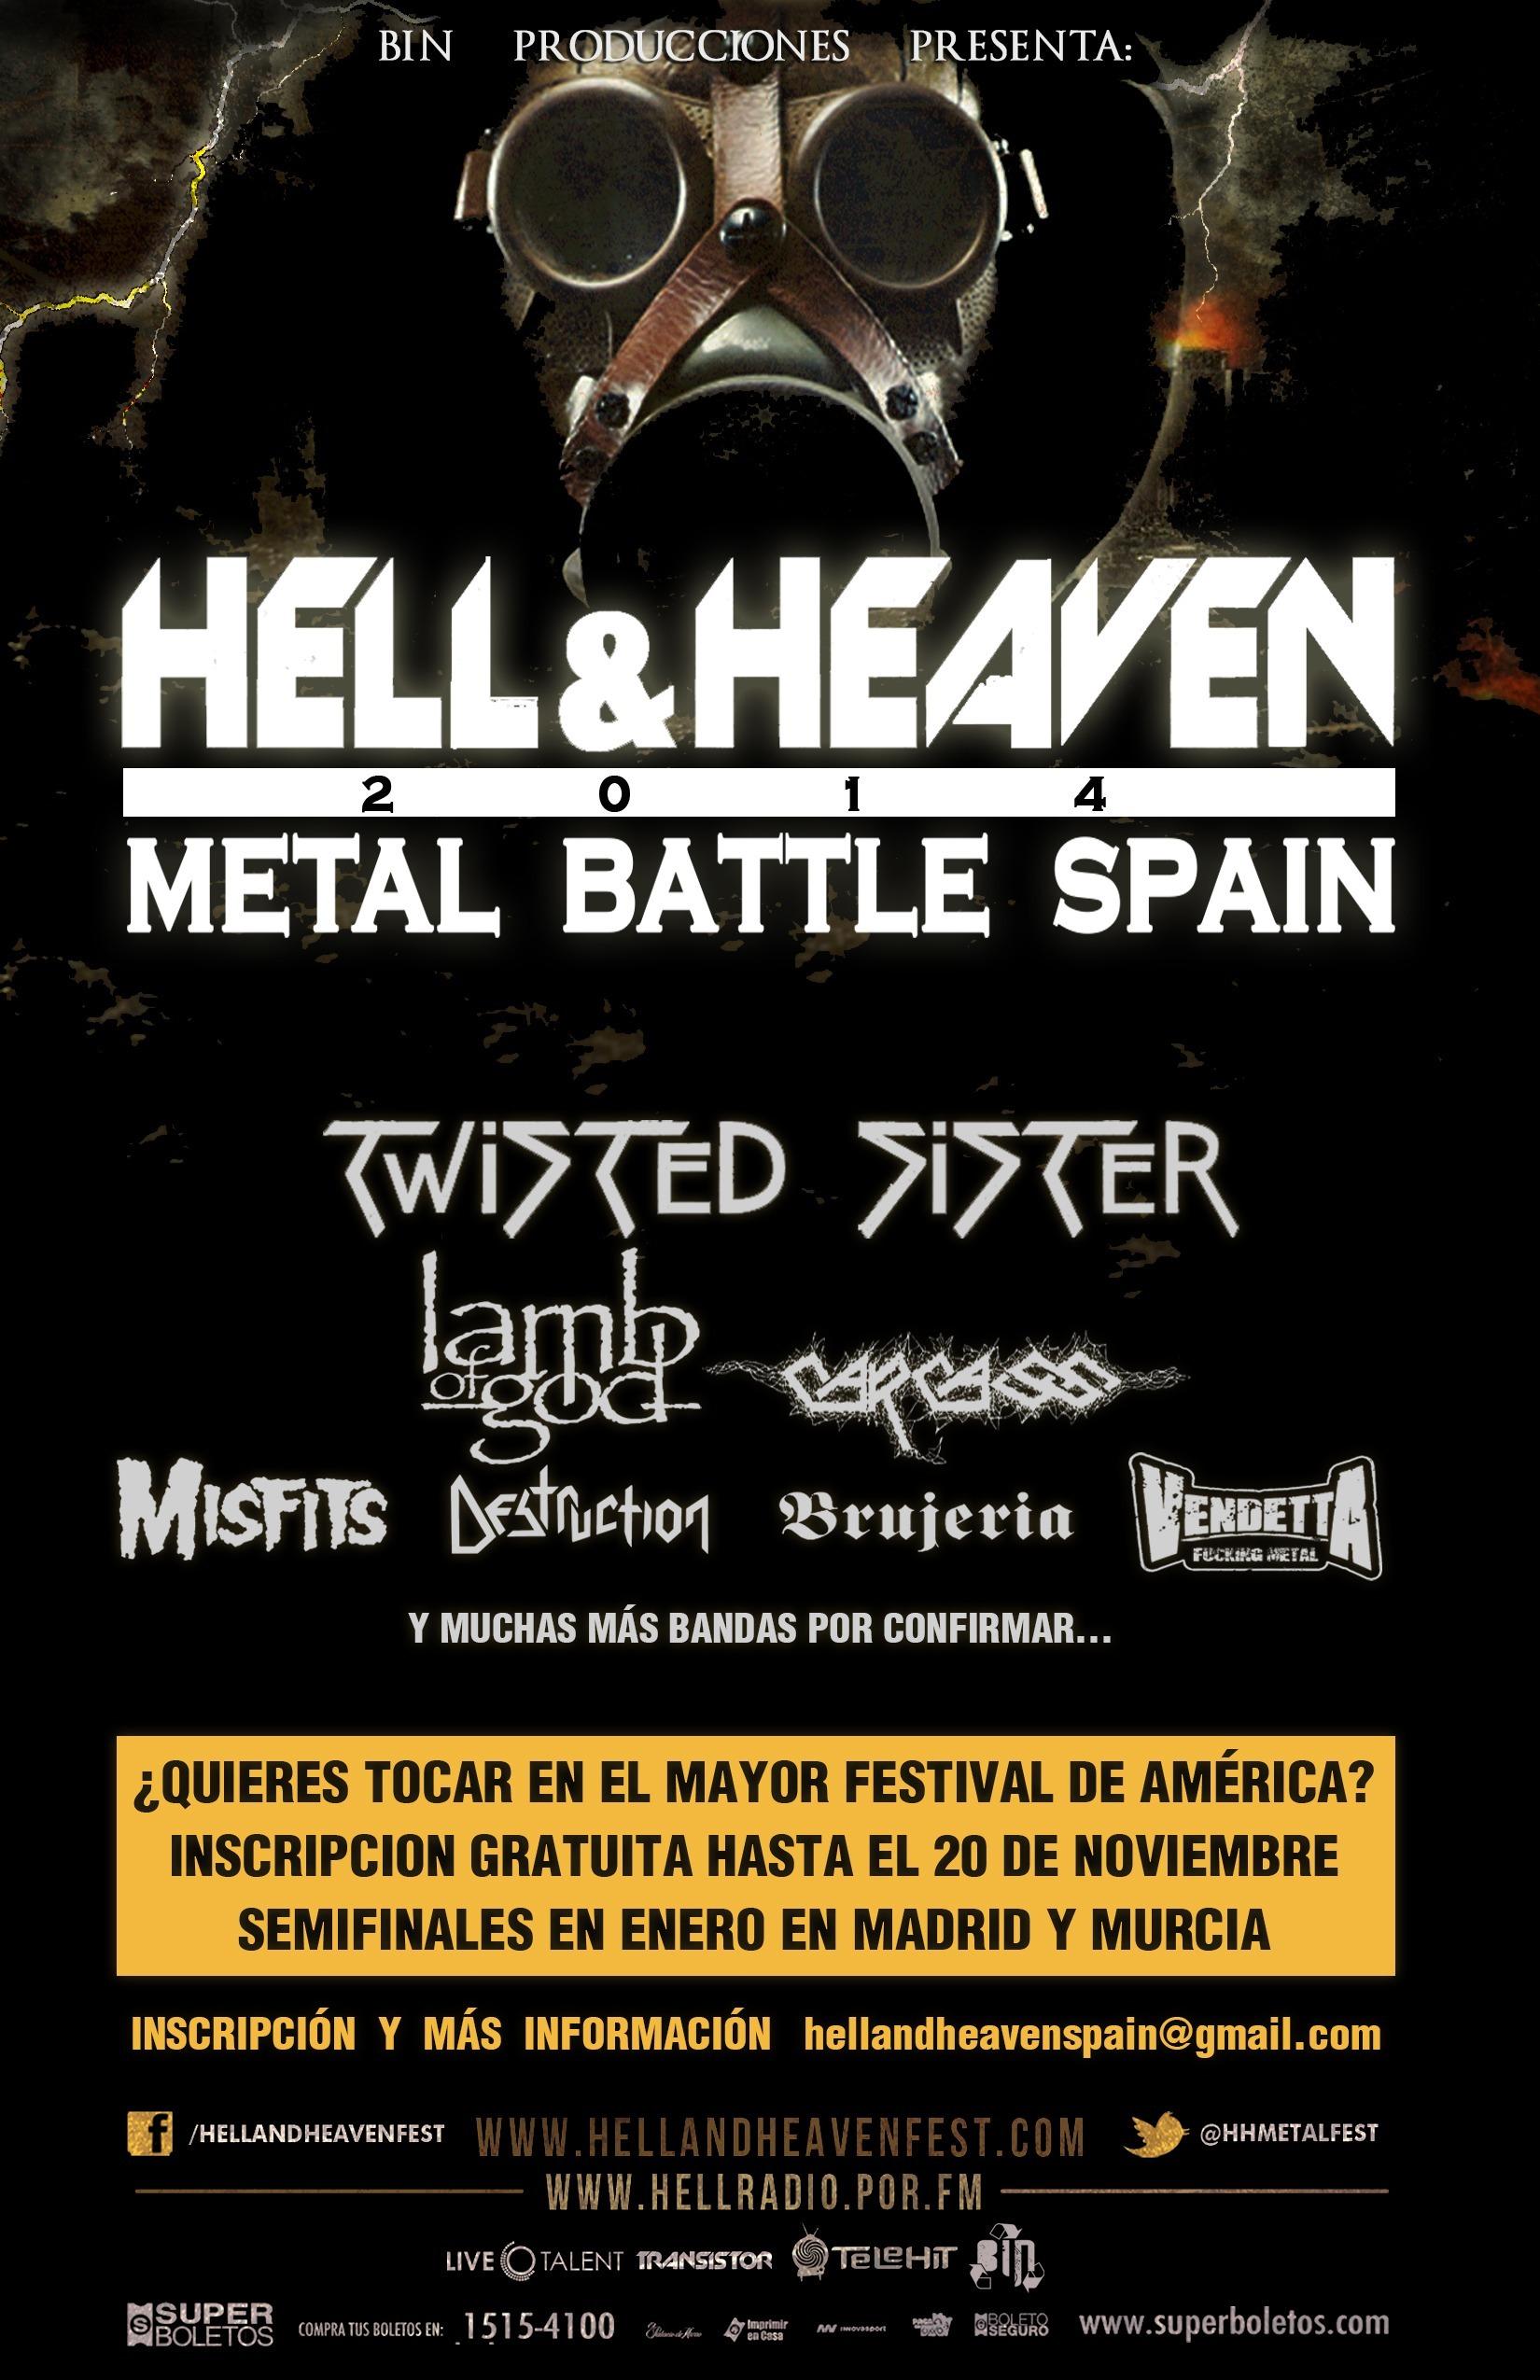 Bandas inscritas al Metal Battle Spain del Hell And Heaven Metal Fest